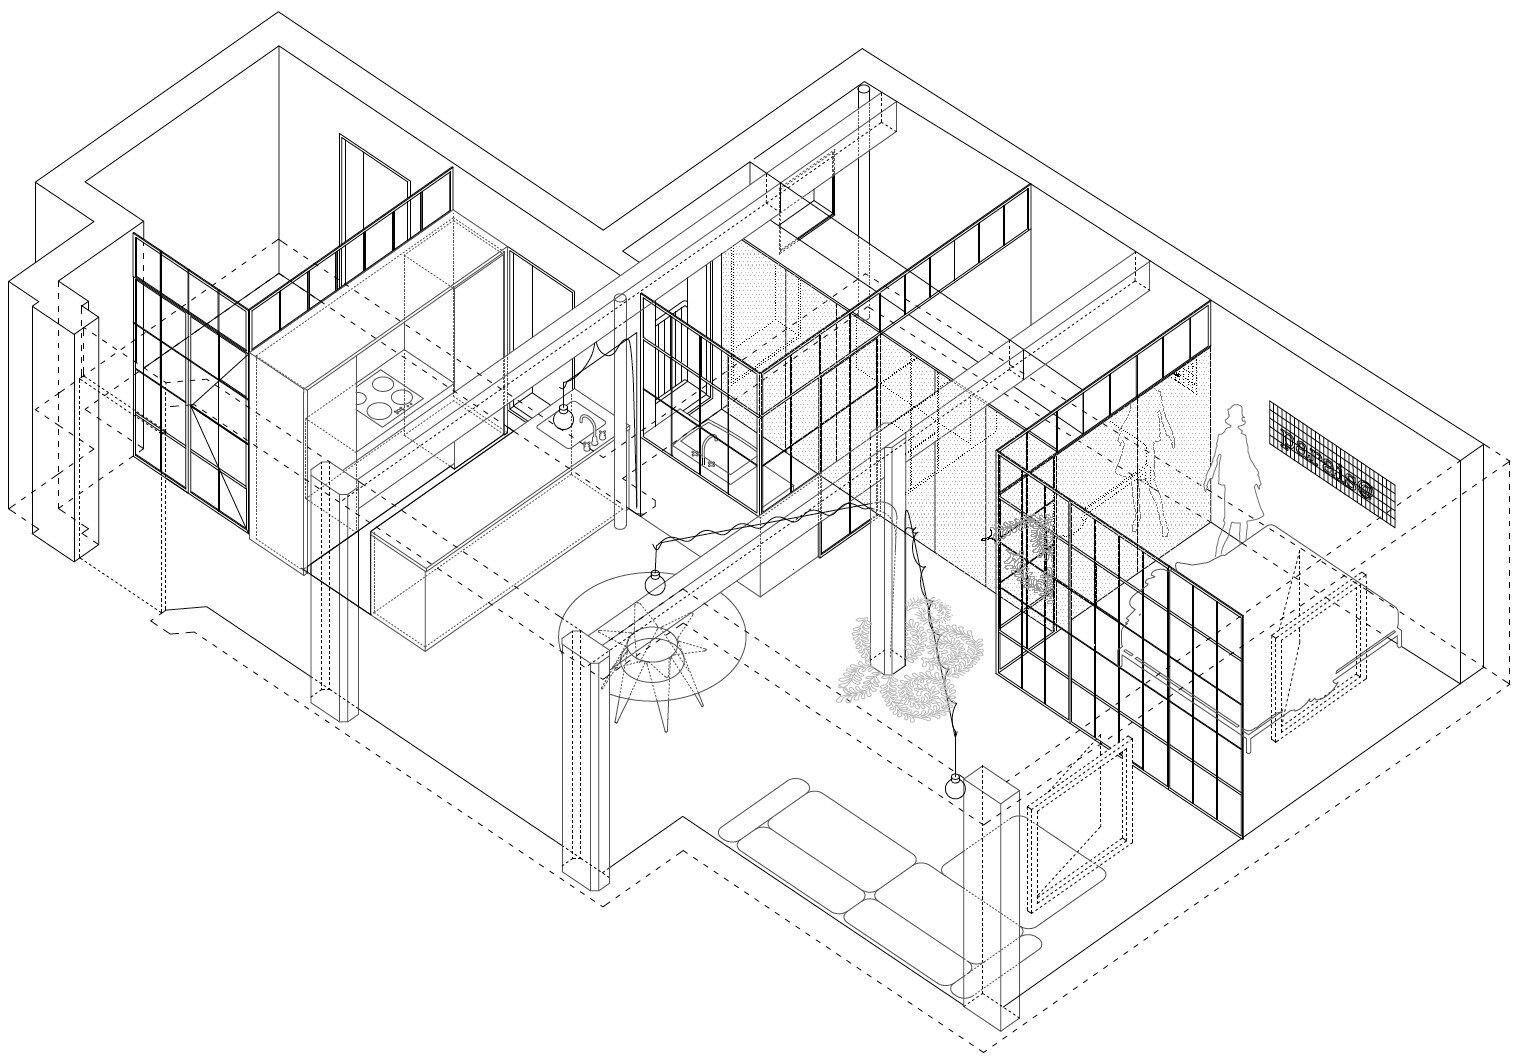 Parais - Manuel Ocaña - Madrid Spain - Layout - Humble Homes